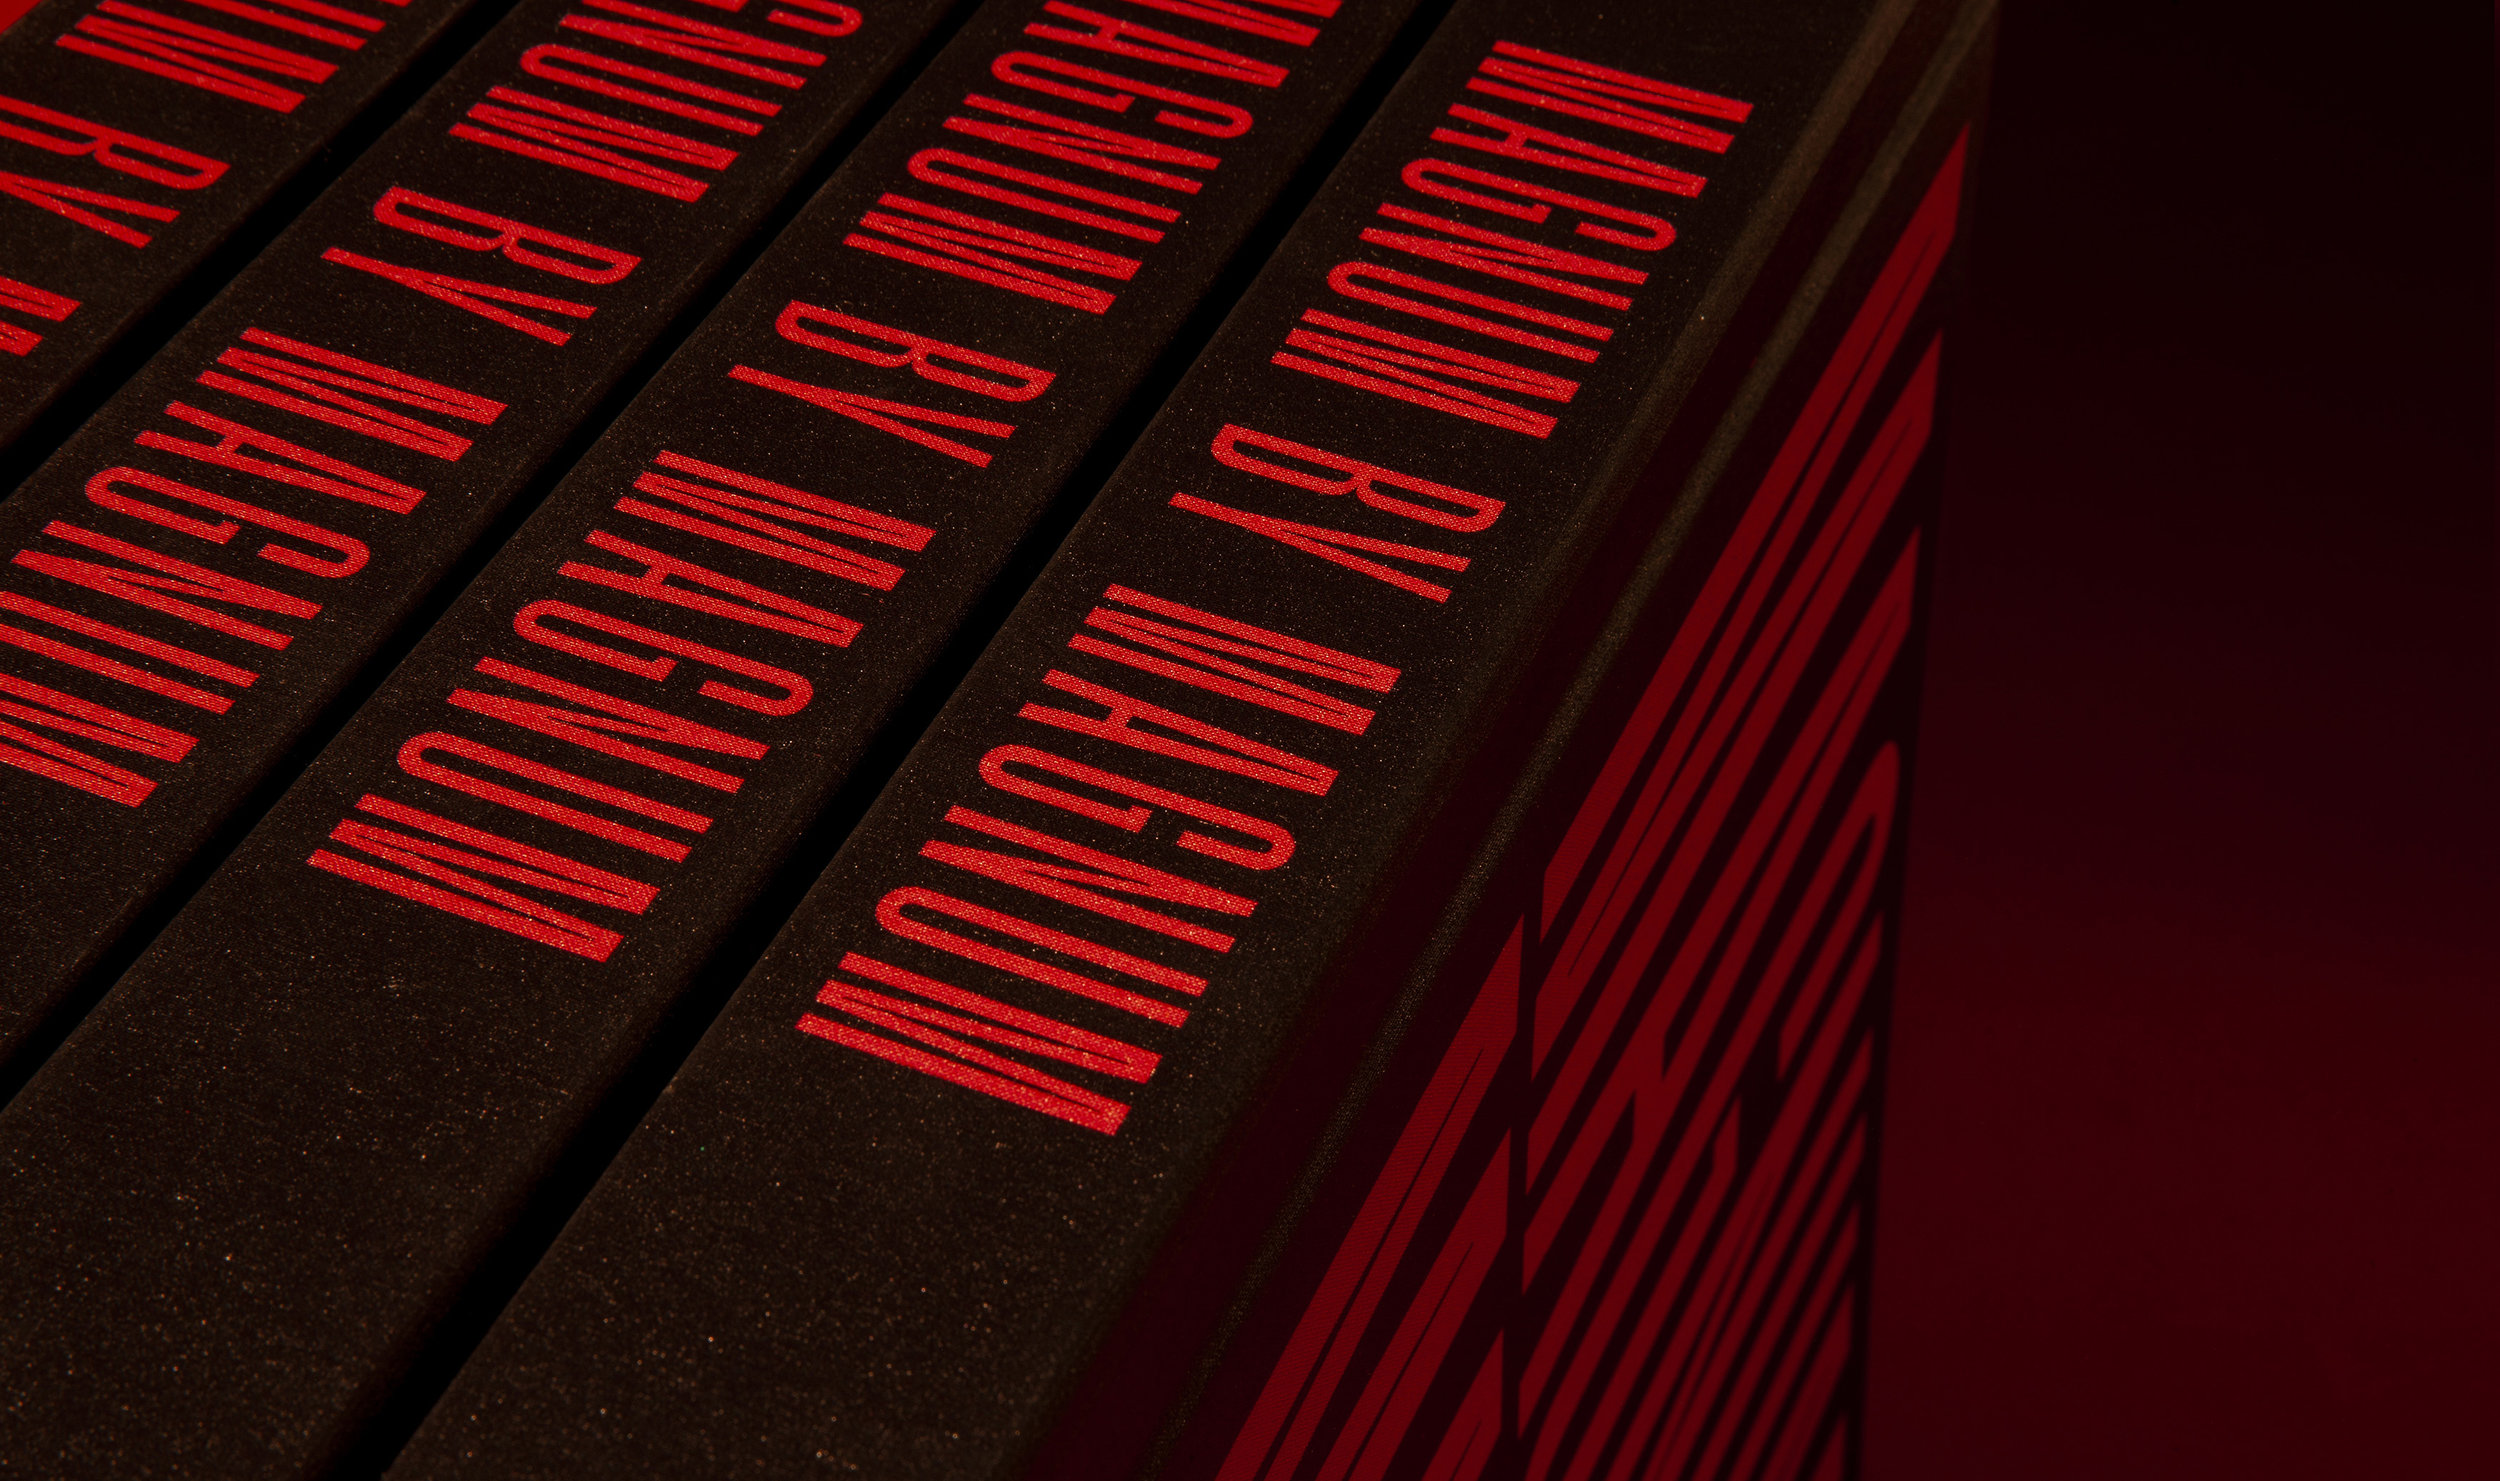 magnum-by-magnum-book3.jpg